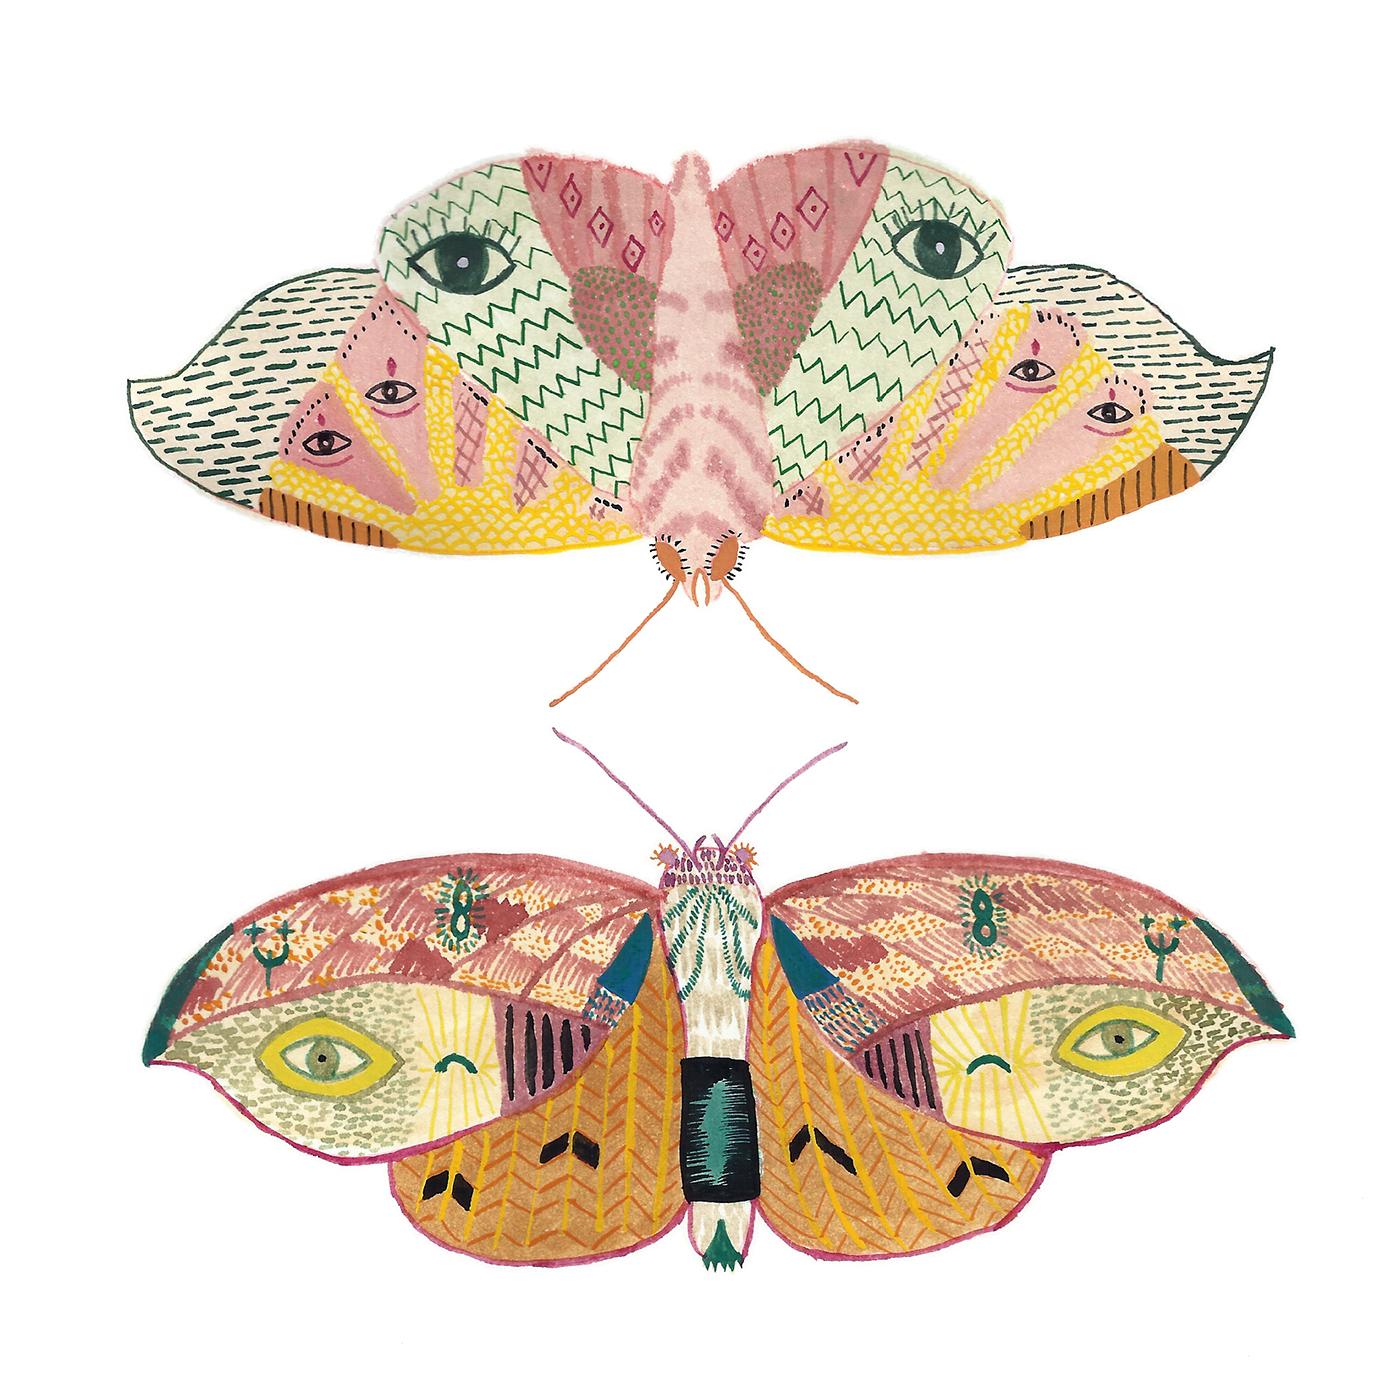 two moths 200dpi.jpg